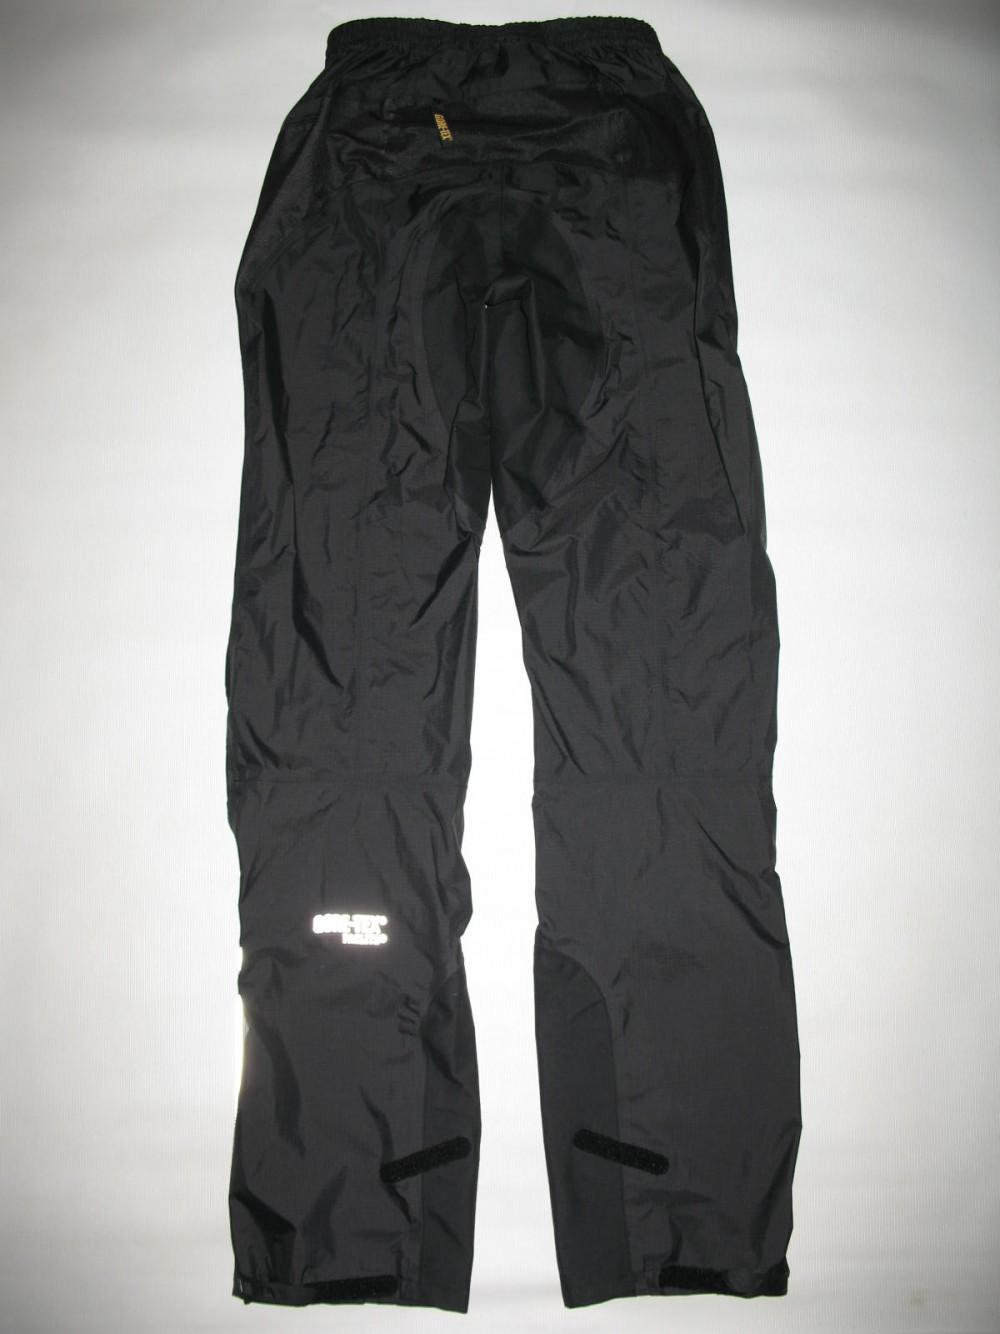 Штаны GORE gtx bike pants lady (размер 34/XS) - 2